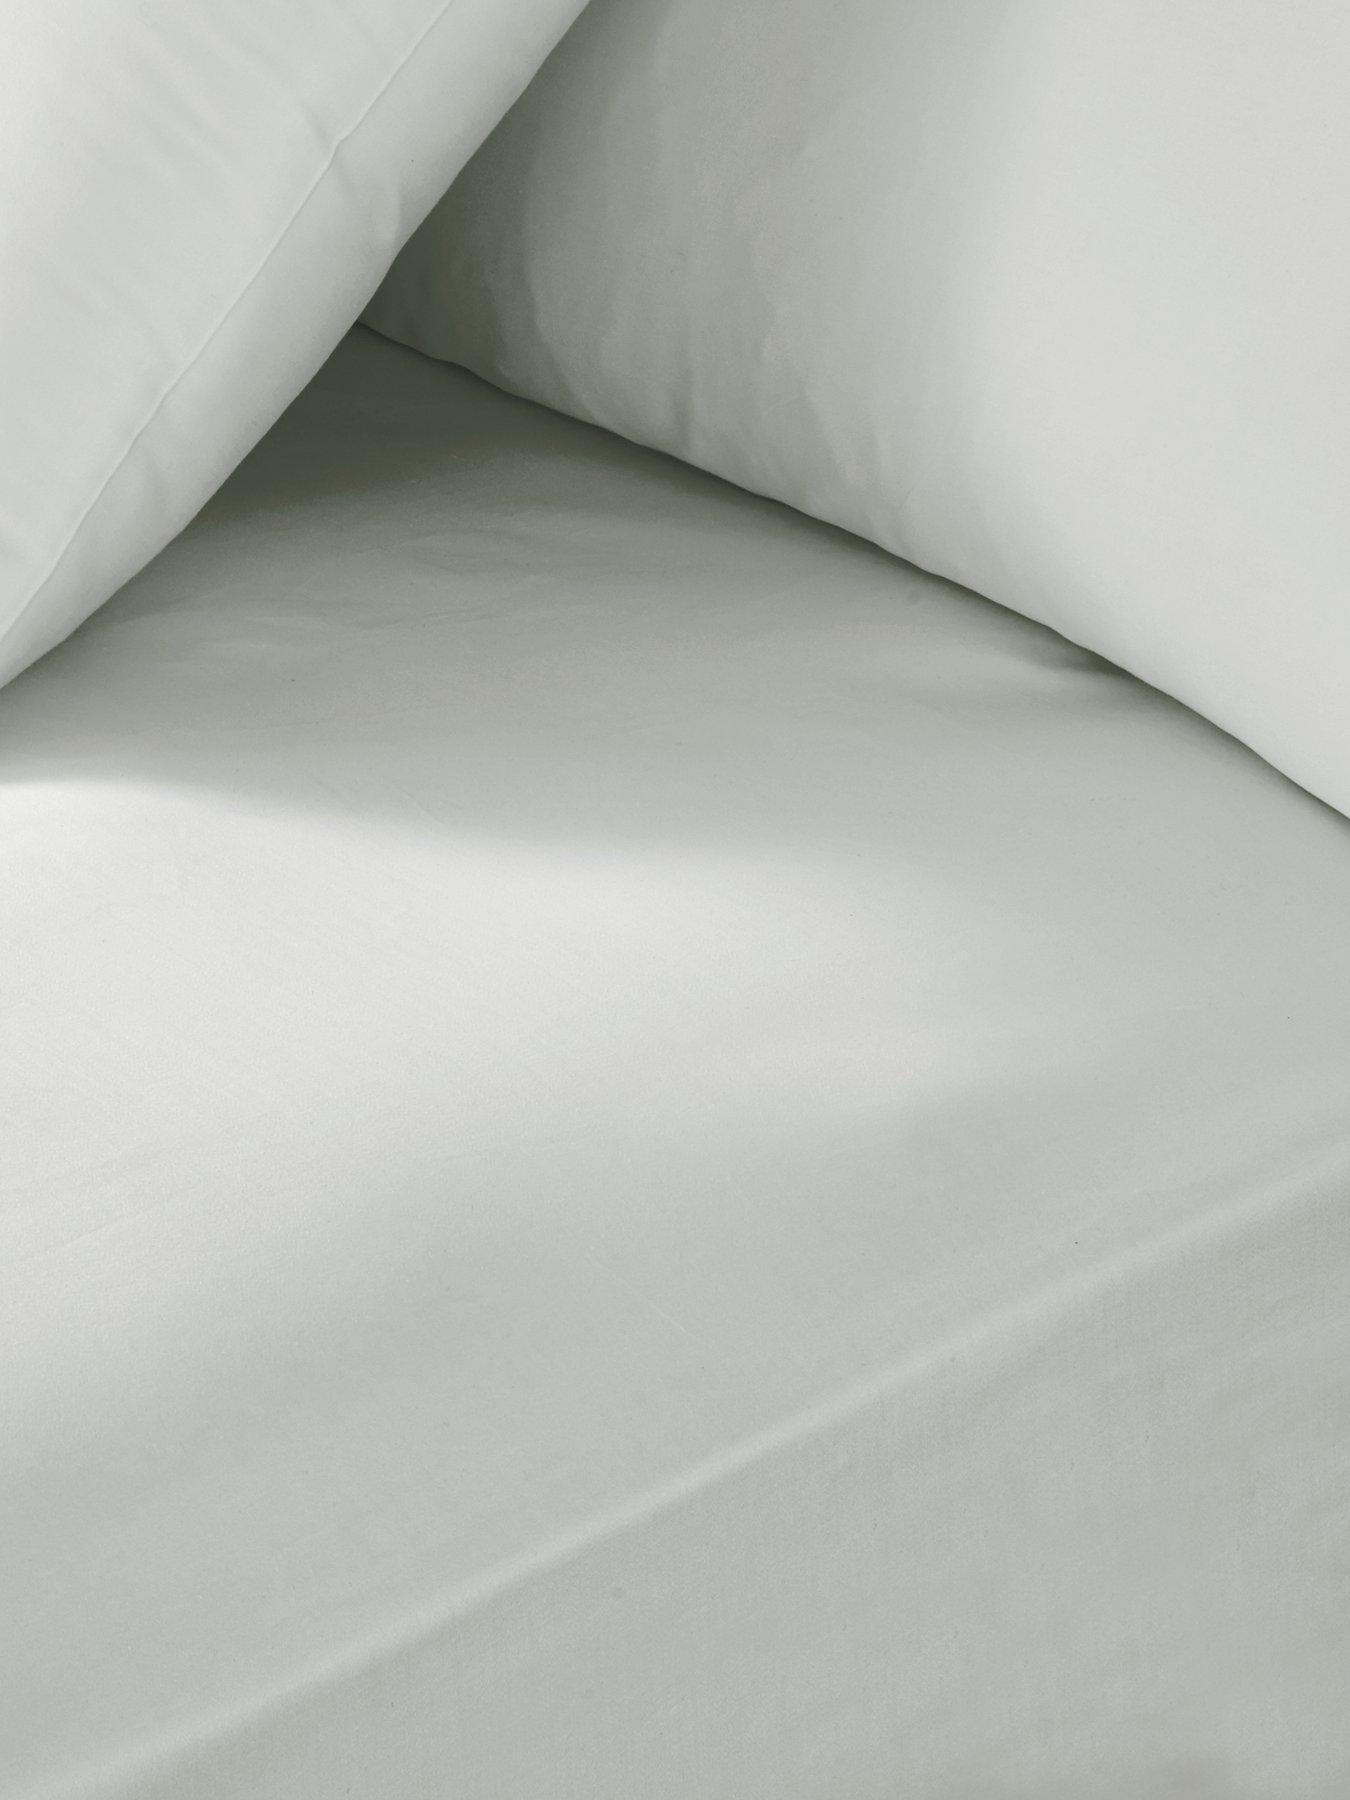 2-King Pillowcases 21 x 40 1-Fitted Sheet 78 x 80 1-Flat Sheet 108 x 102 UNK Polar Bear Sweaters King Flannel Sheet Set